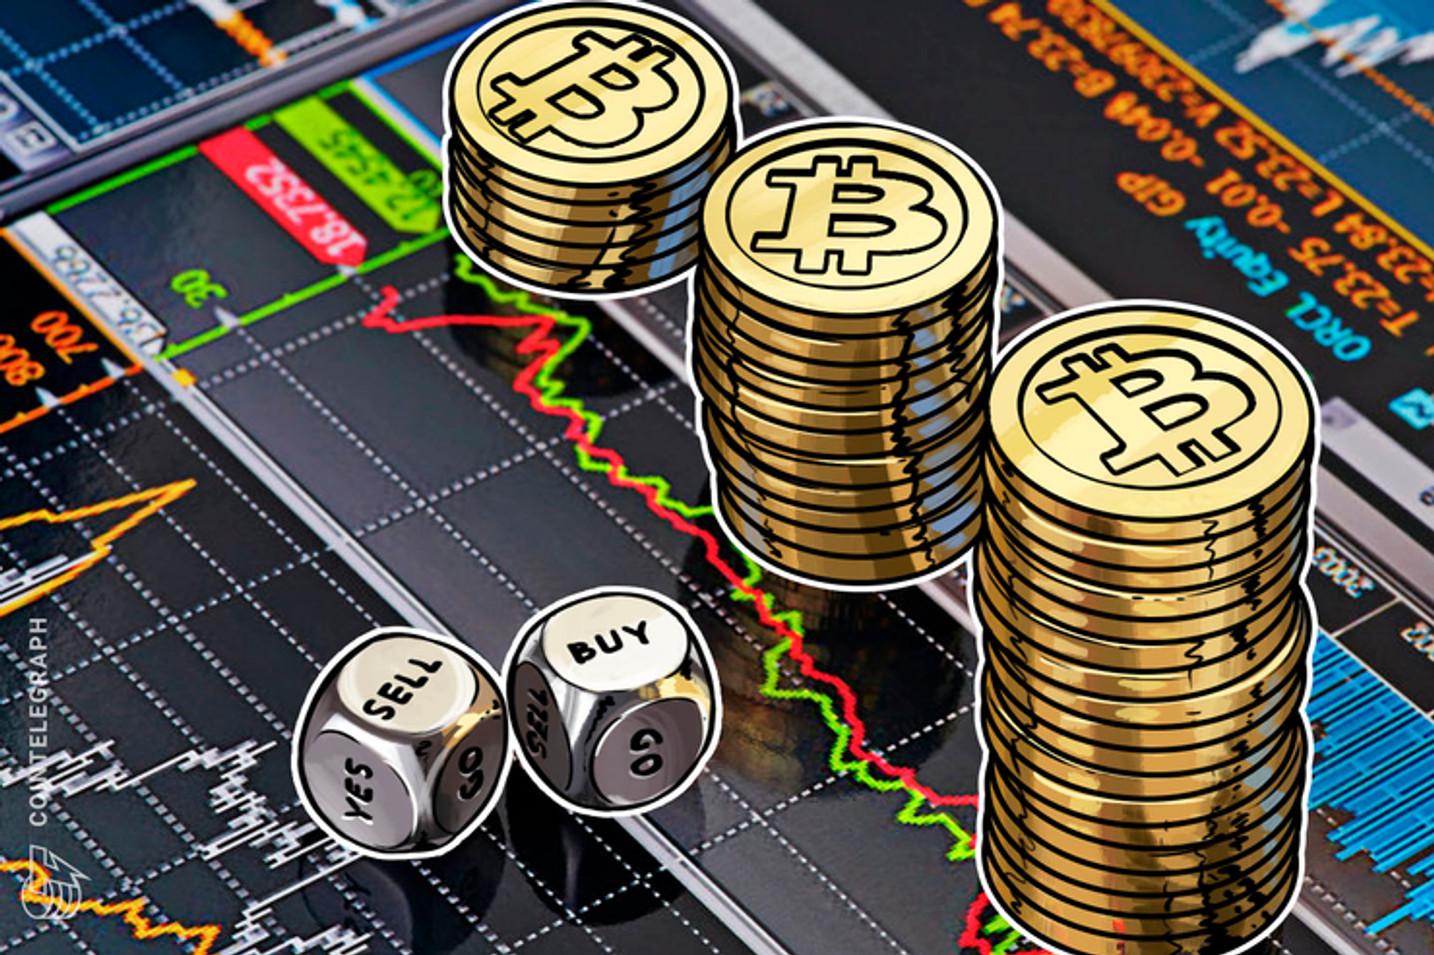 Analista que previu bear market de 2018 prevê nova queda para o Bitcoin depois do halving